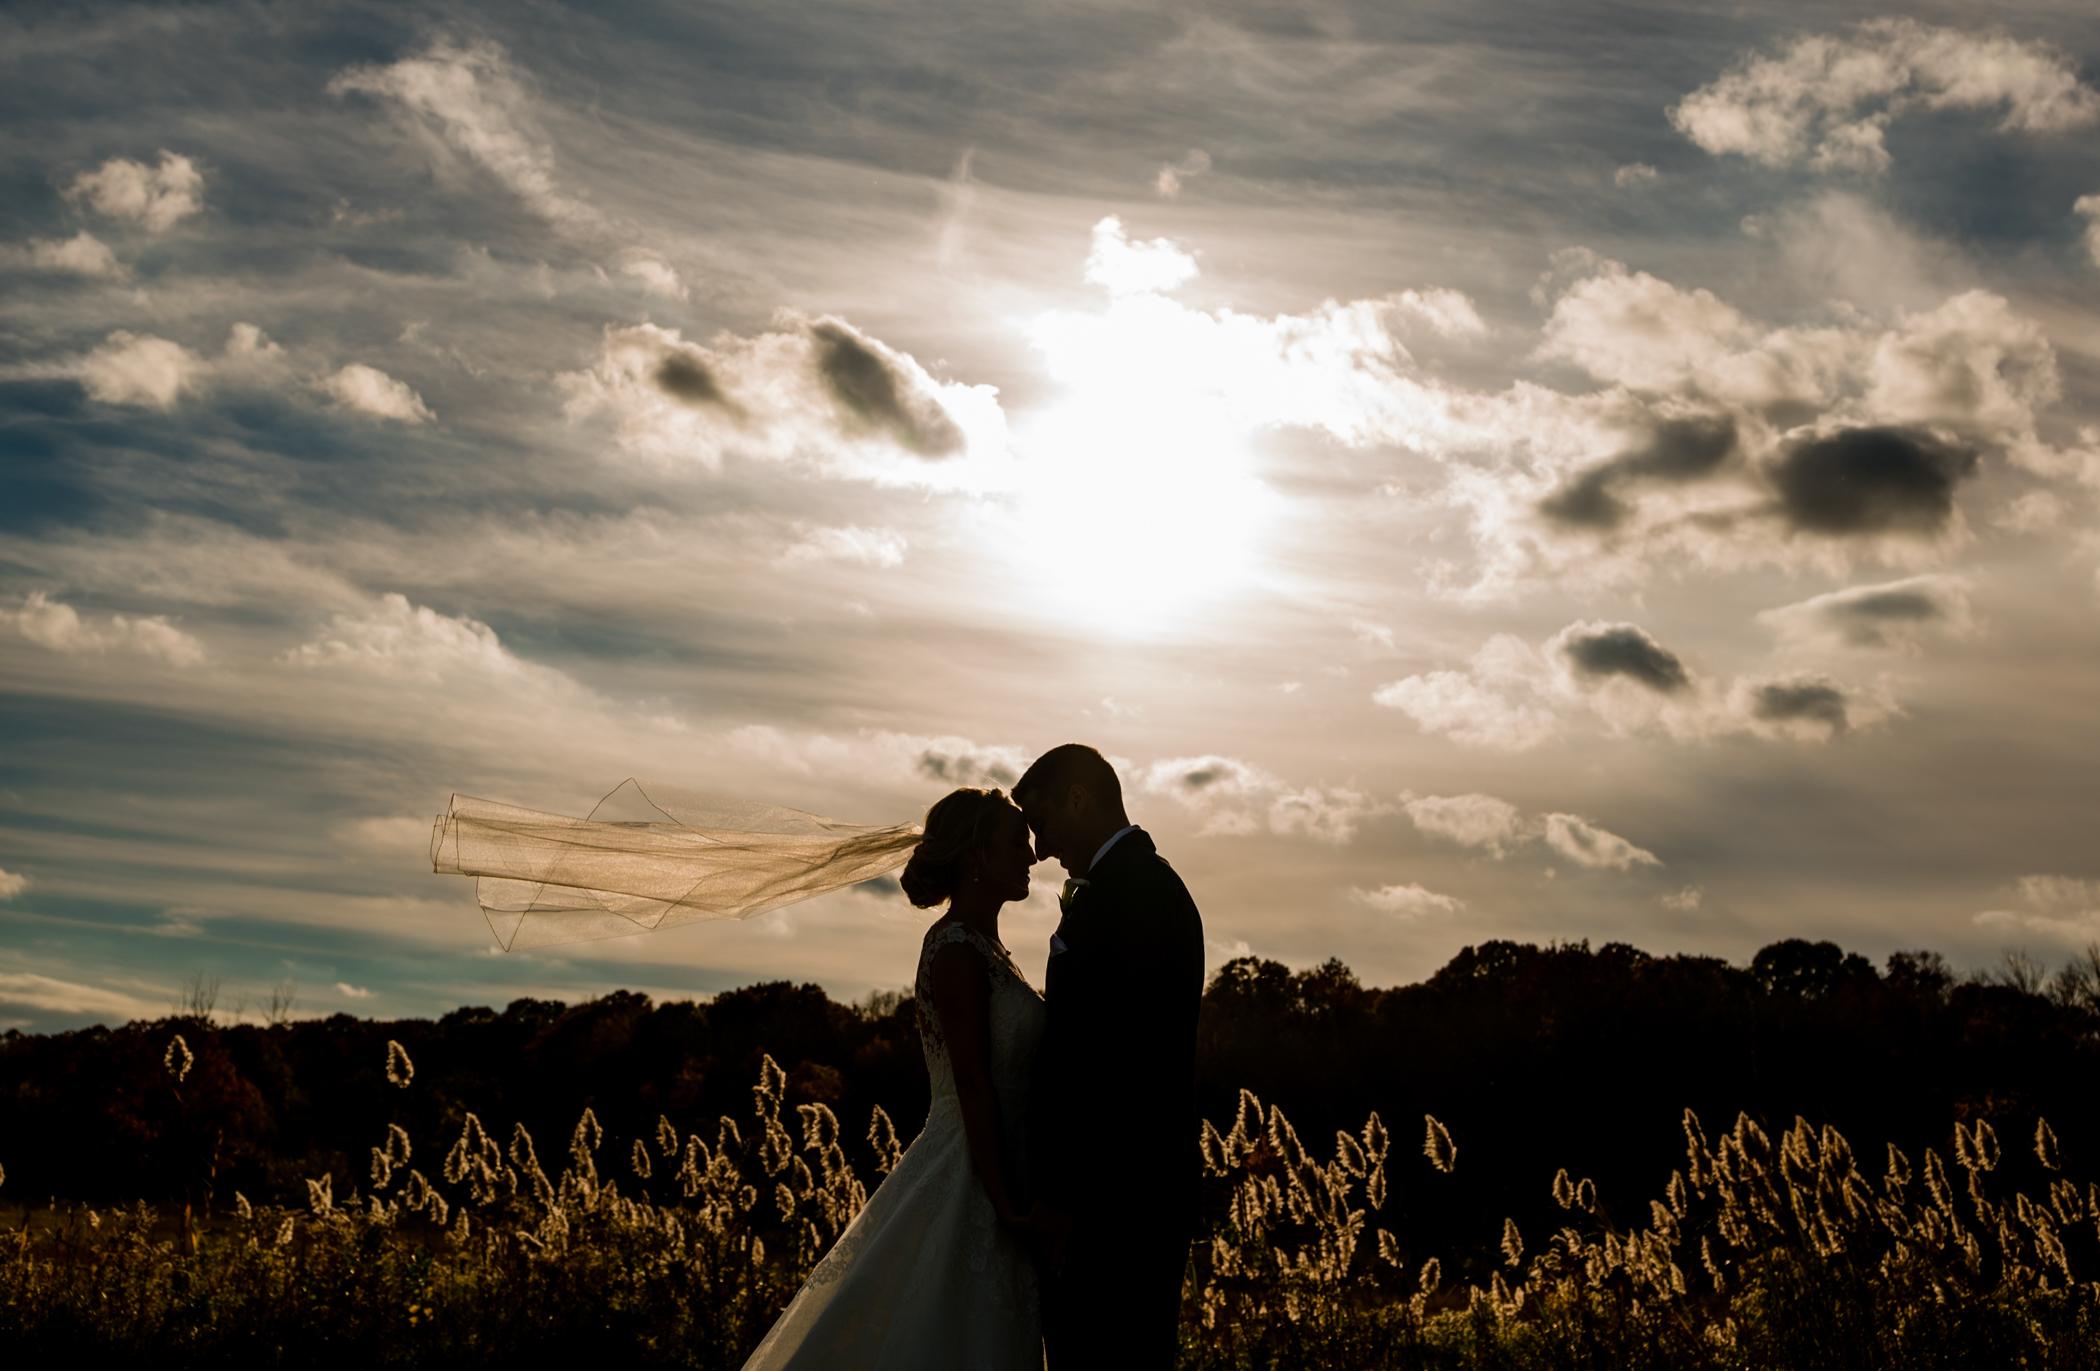 saltwater-farm-vineyard-stonington-connecticut-wedding-photographer-chris-nachtwey-2016-5.jpg